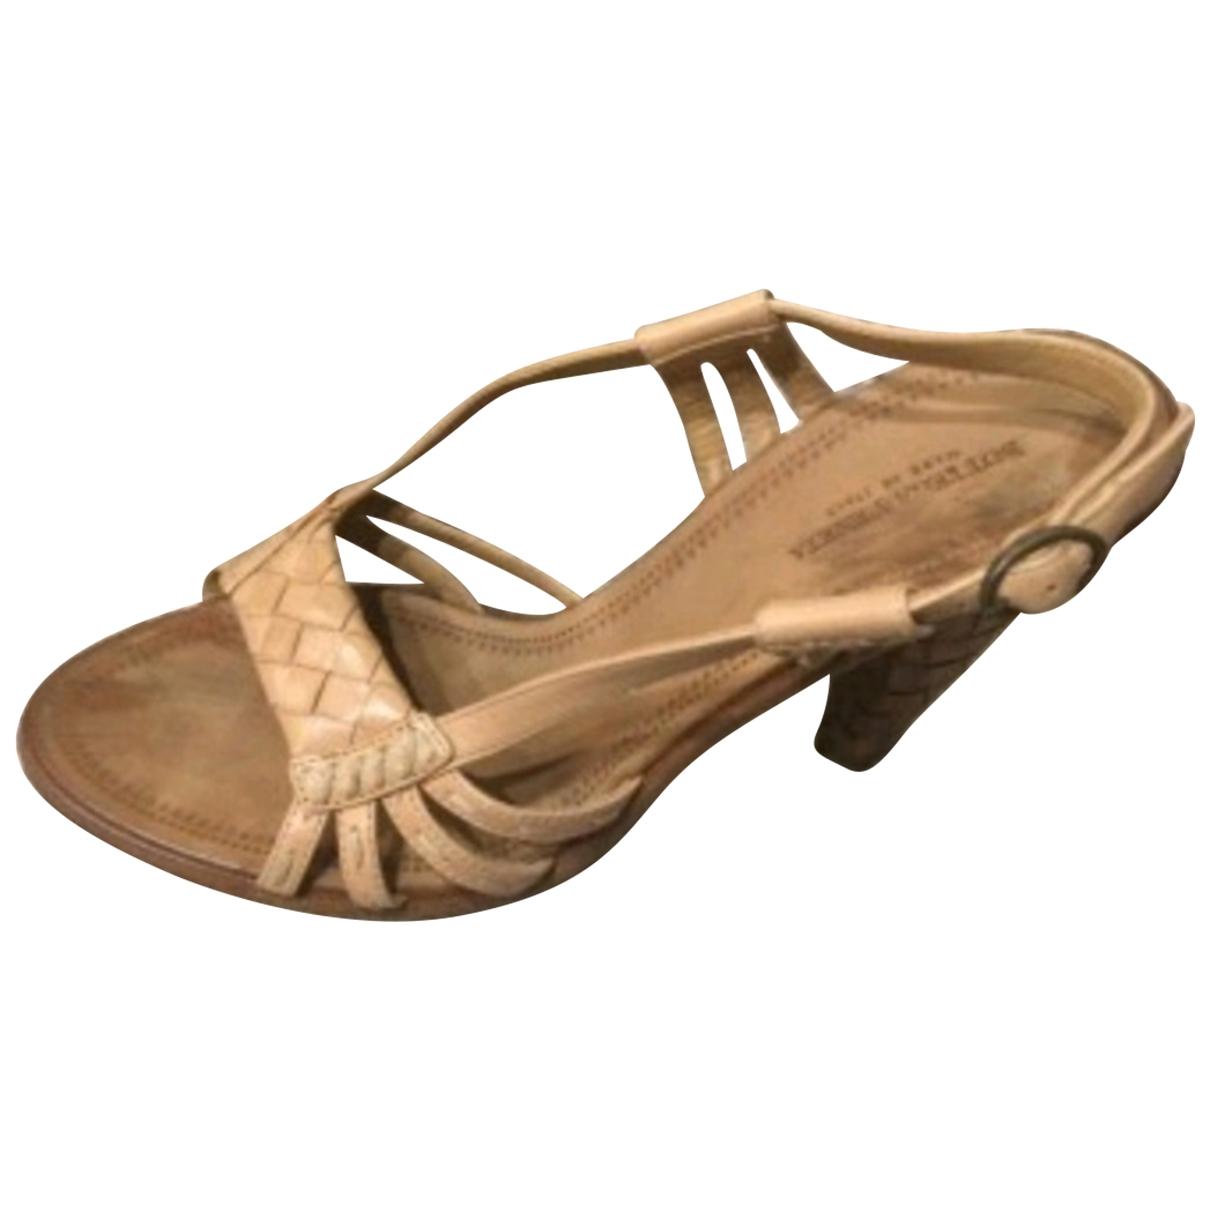 Bottega Veneta - Sandales   pour femme en cuir - camel